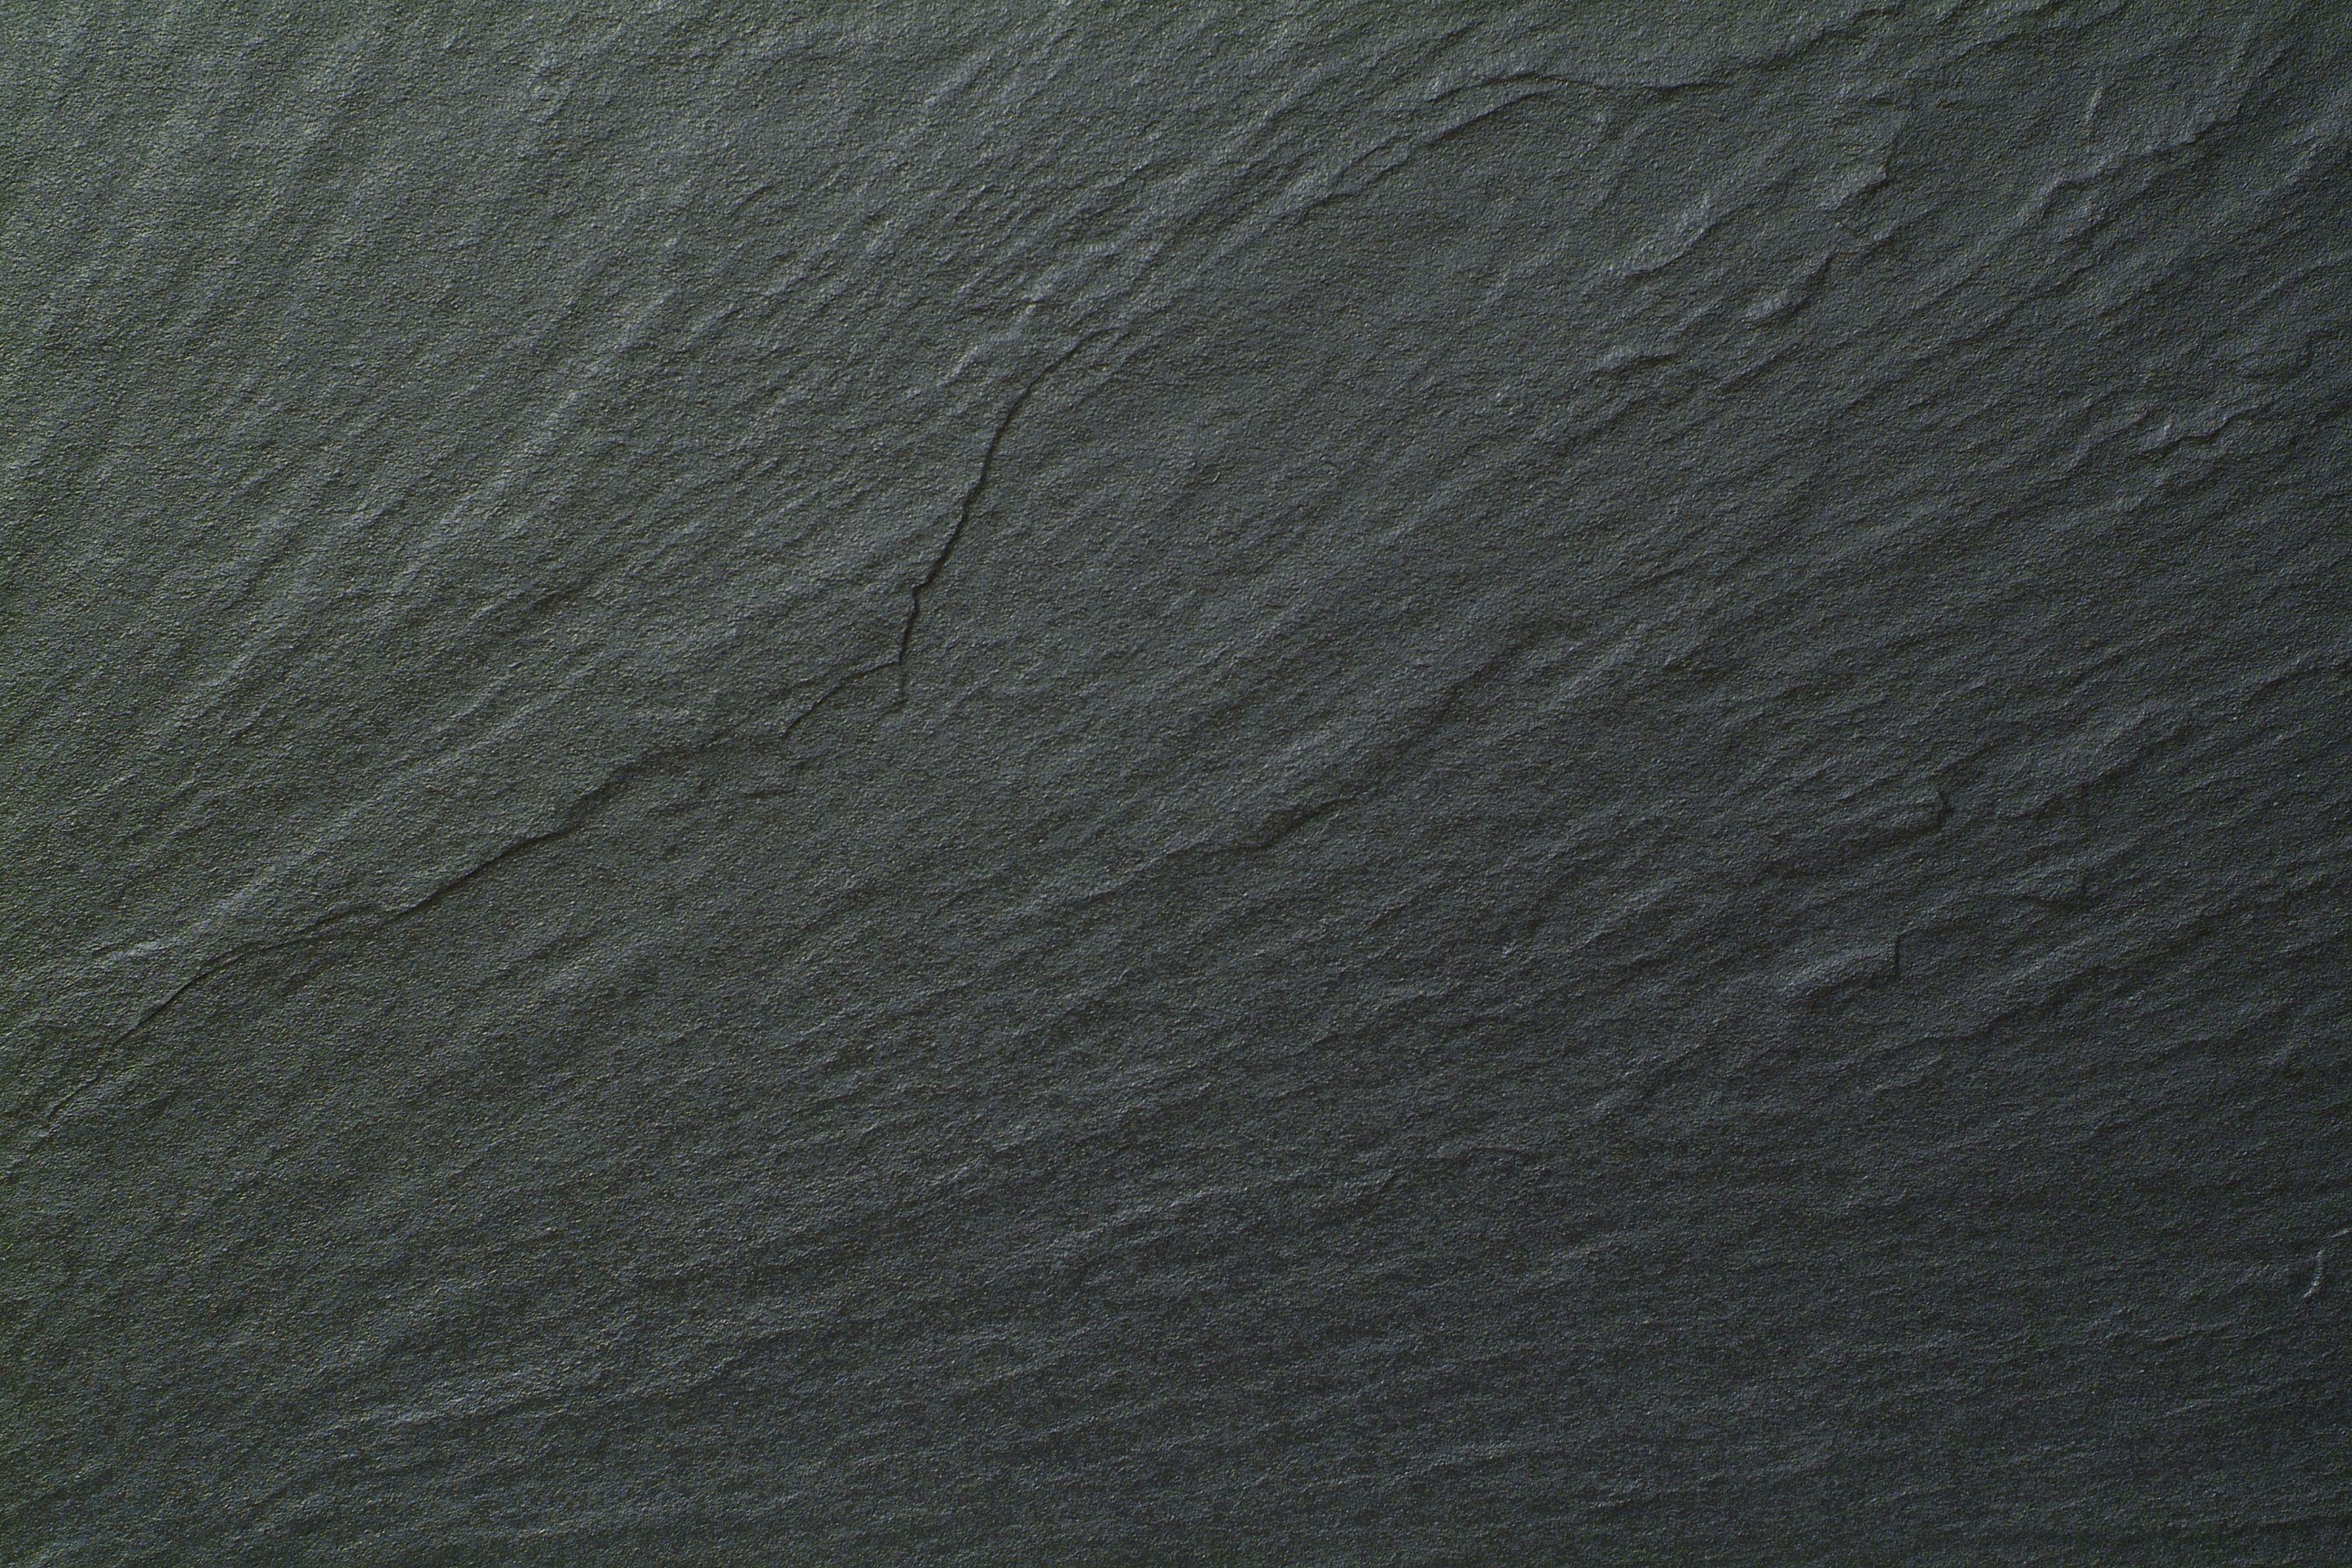 Slate Texture Inspiration 59779 Tile Design Architecture